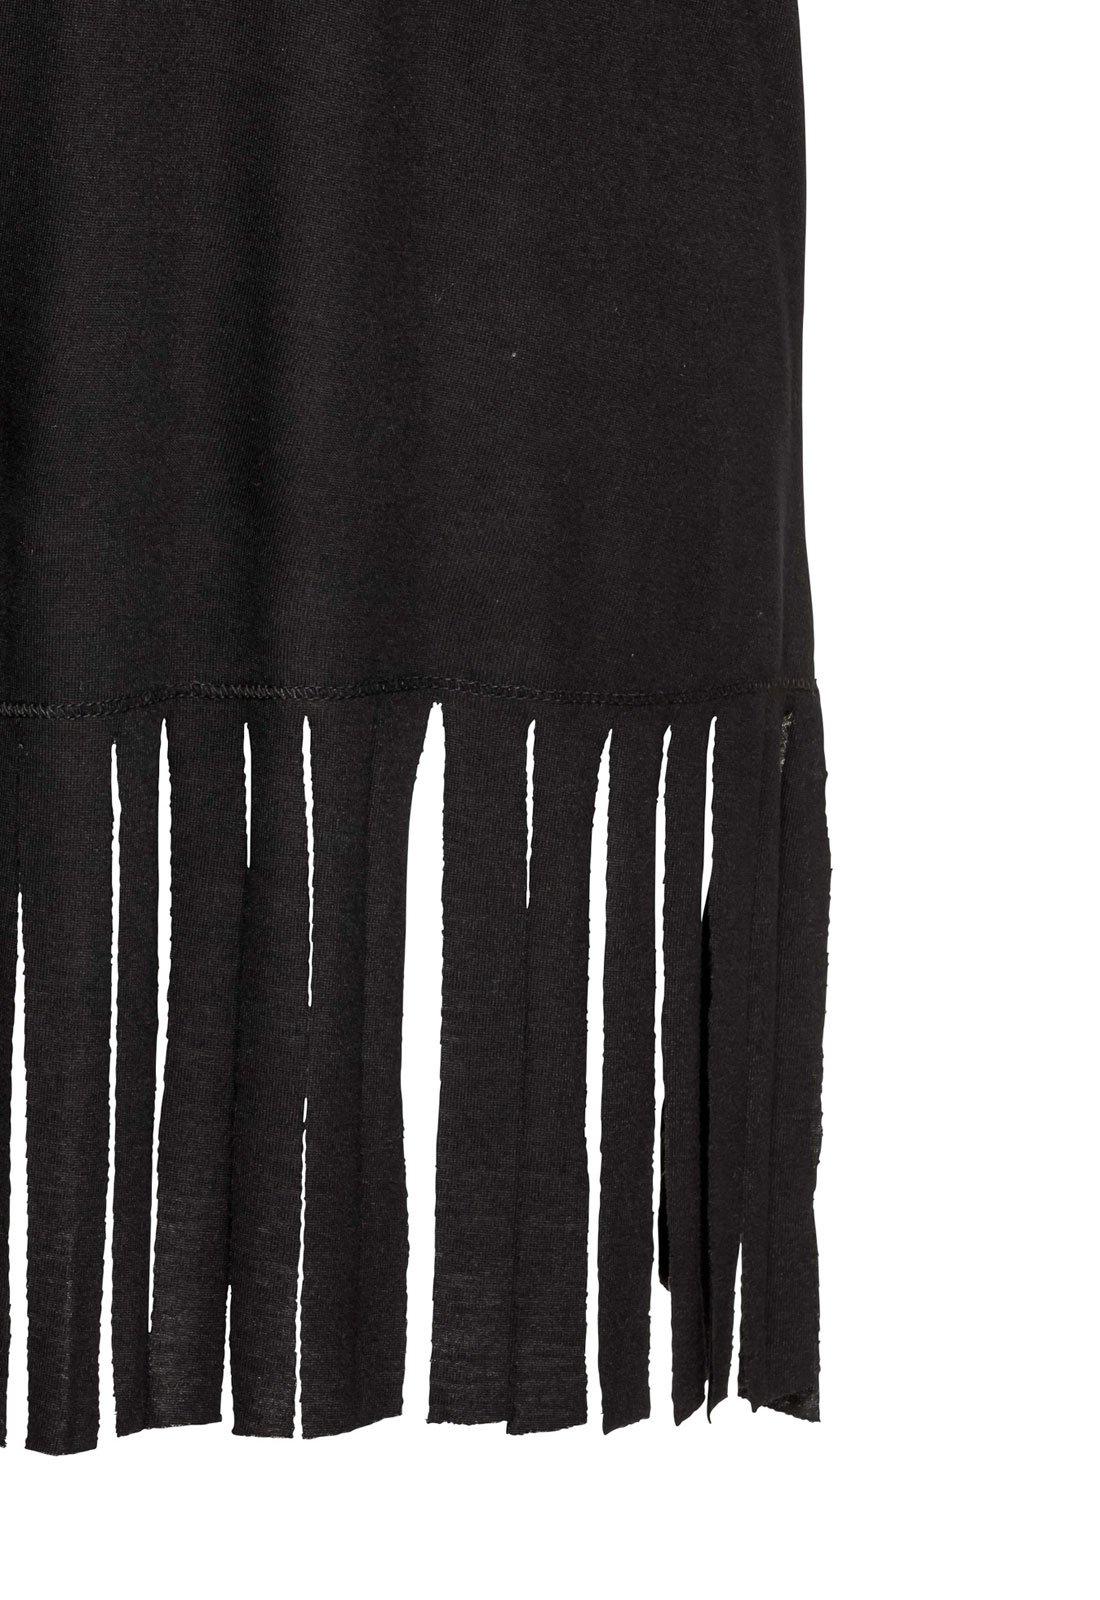 Rainlover Womens Letters Print Baggy Swimwear Bikini Cover-ups Beach Dress (BB-Black) by Rainlover (Image #6)